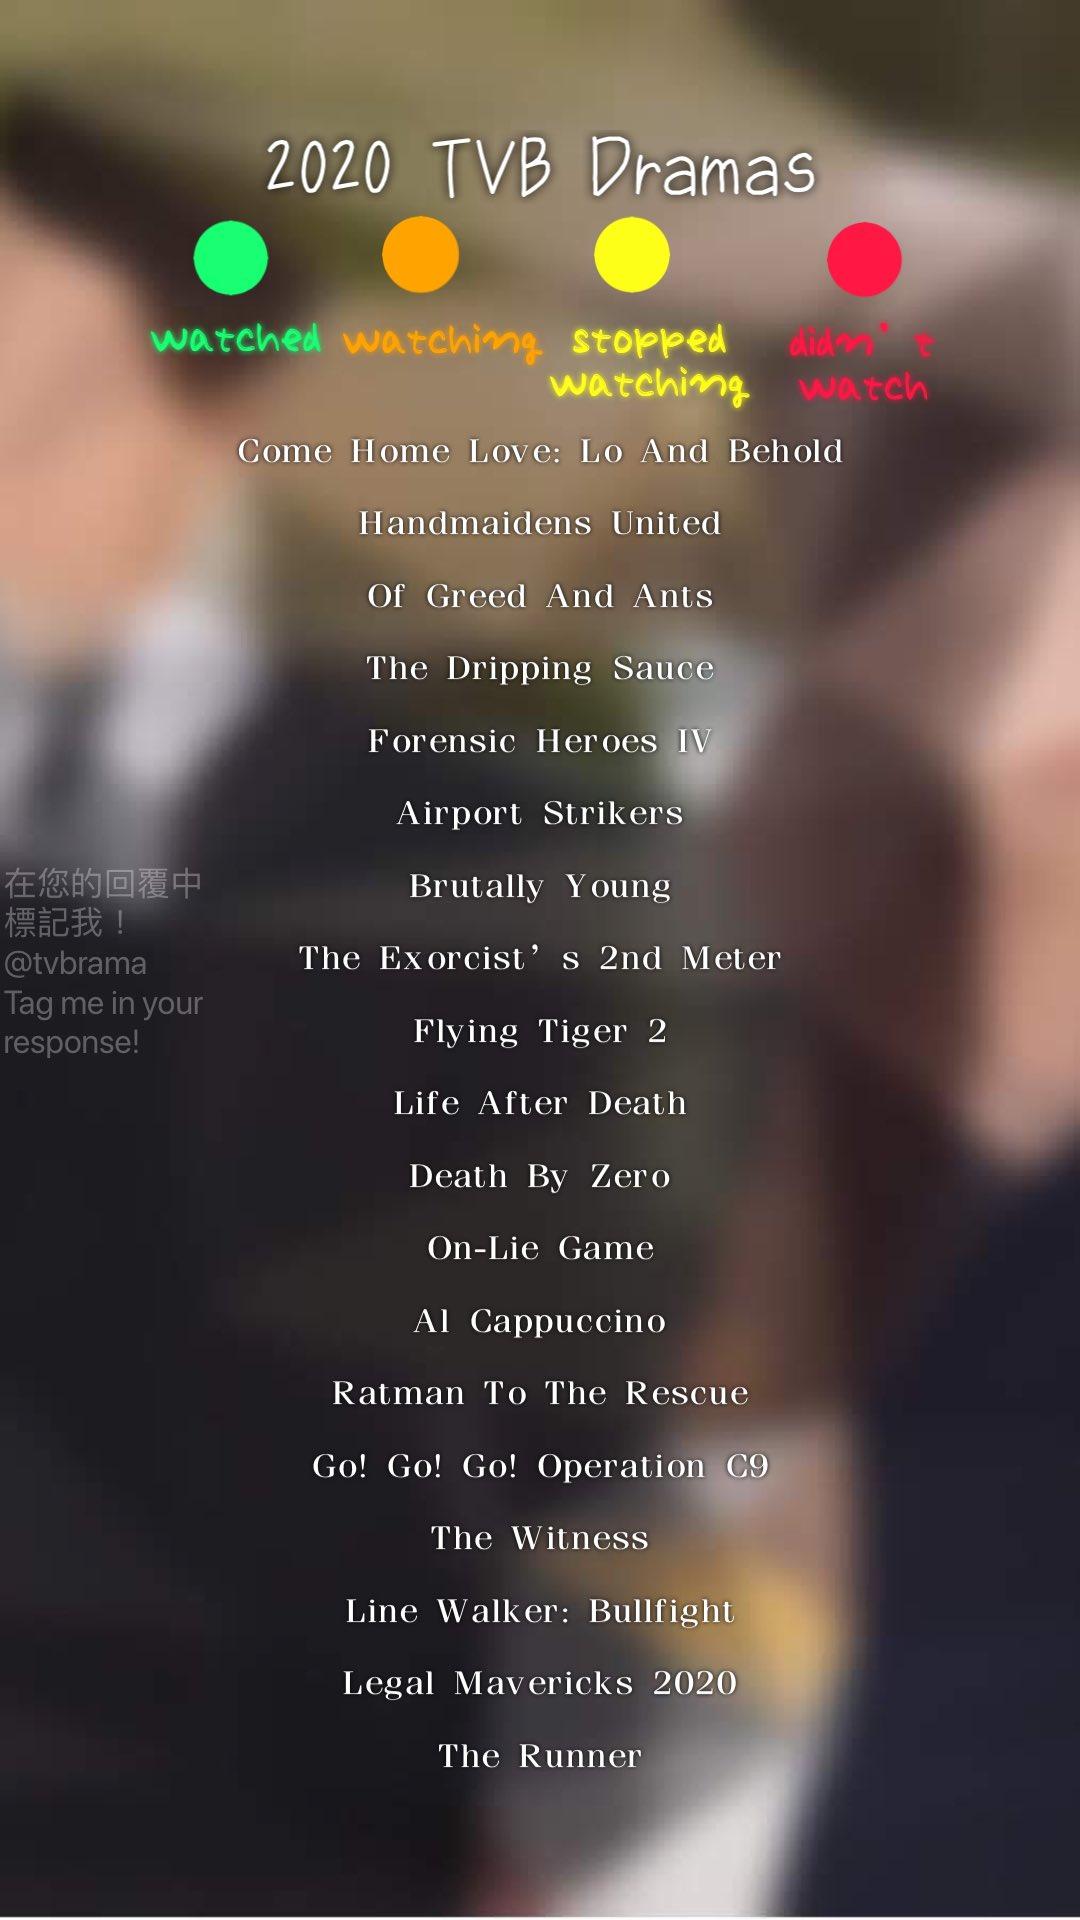 ˏˋ TVB Dramas ˎˊ˗ on Twitter